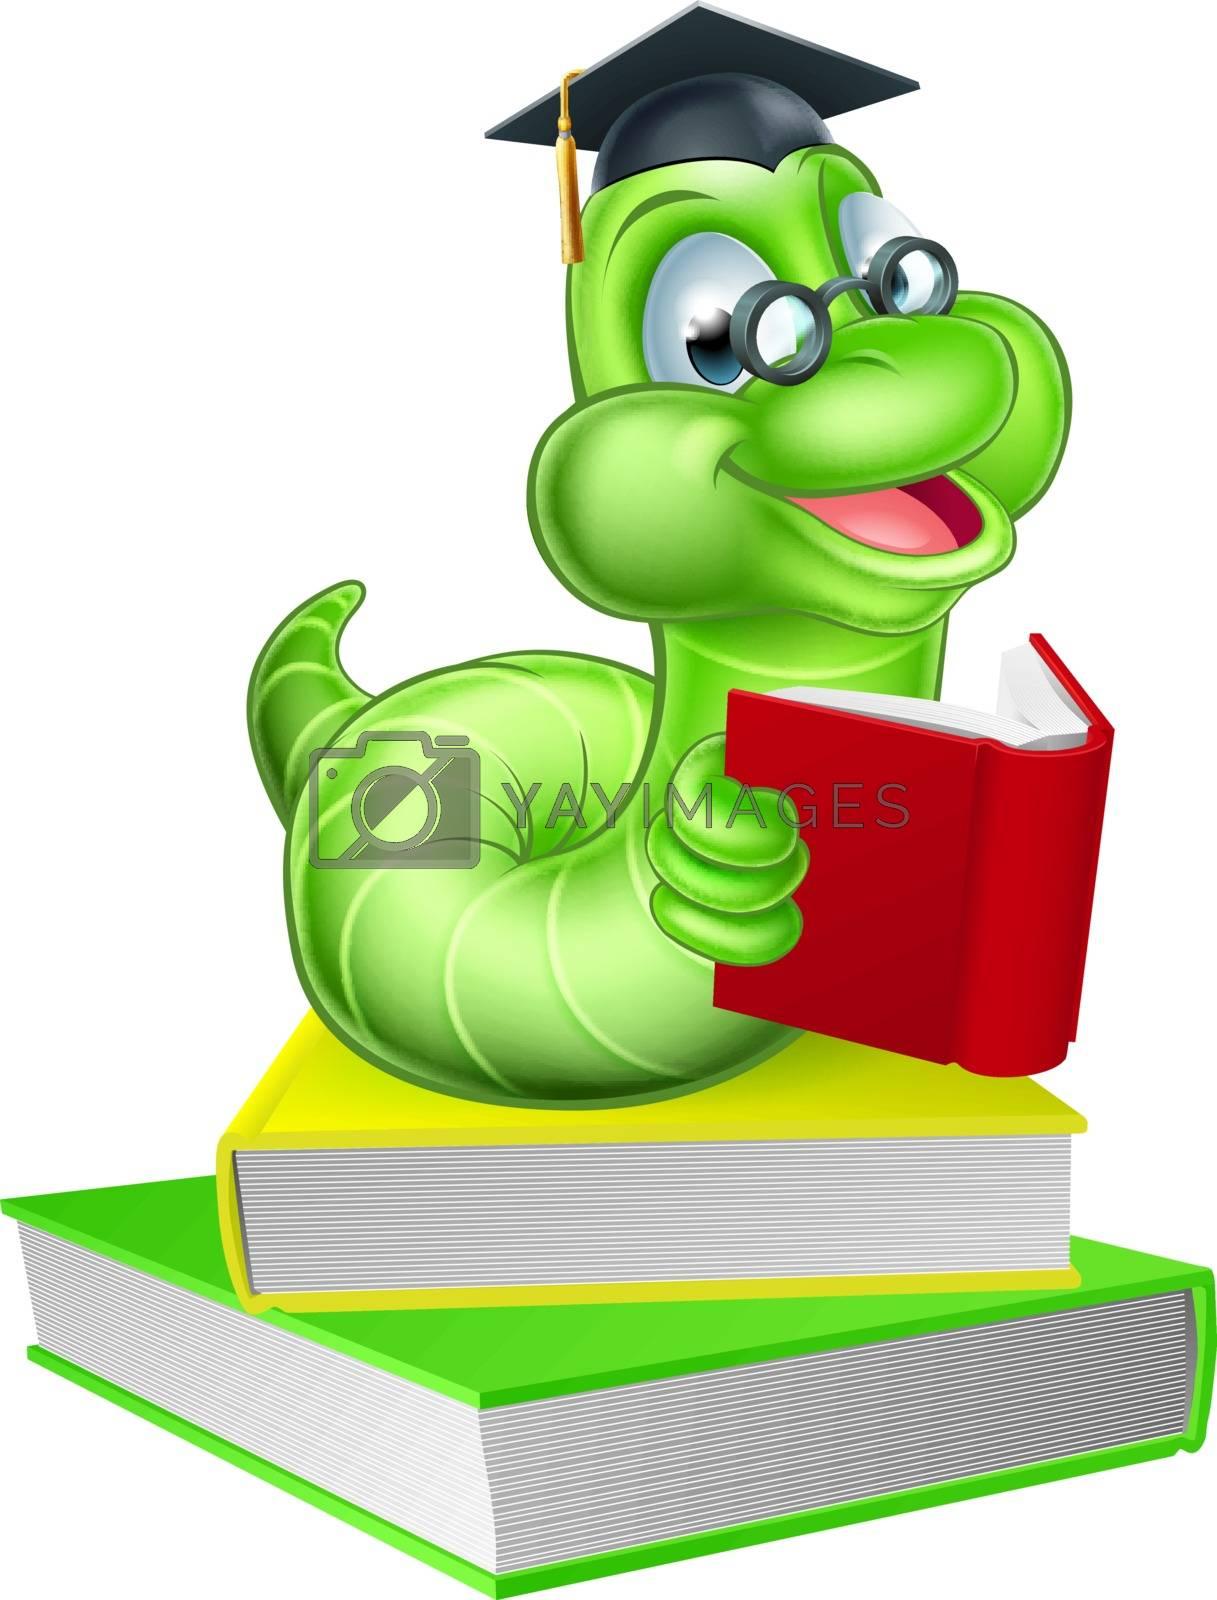 Cute smiling green cartoon caterpillar worm bookworm mascot wearing glasses and mortar board graduation hat reading a book